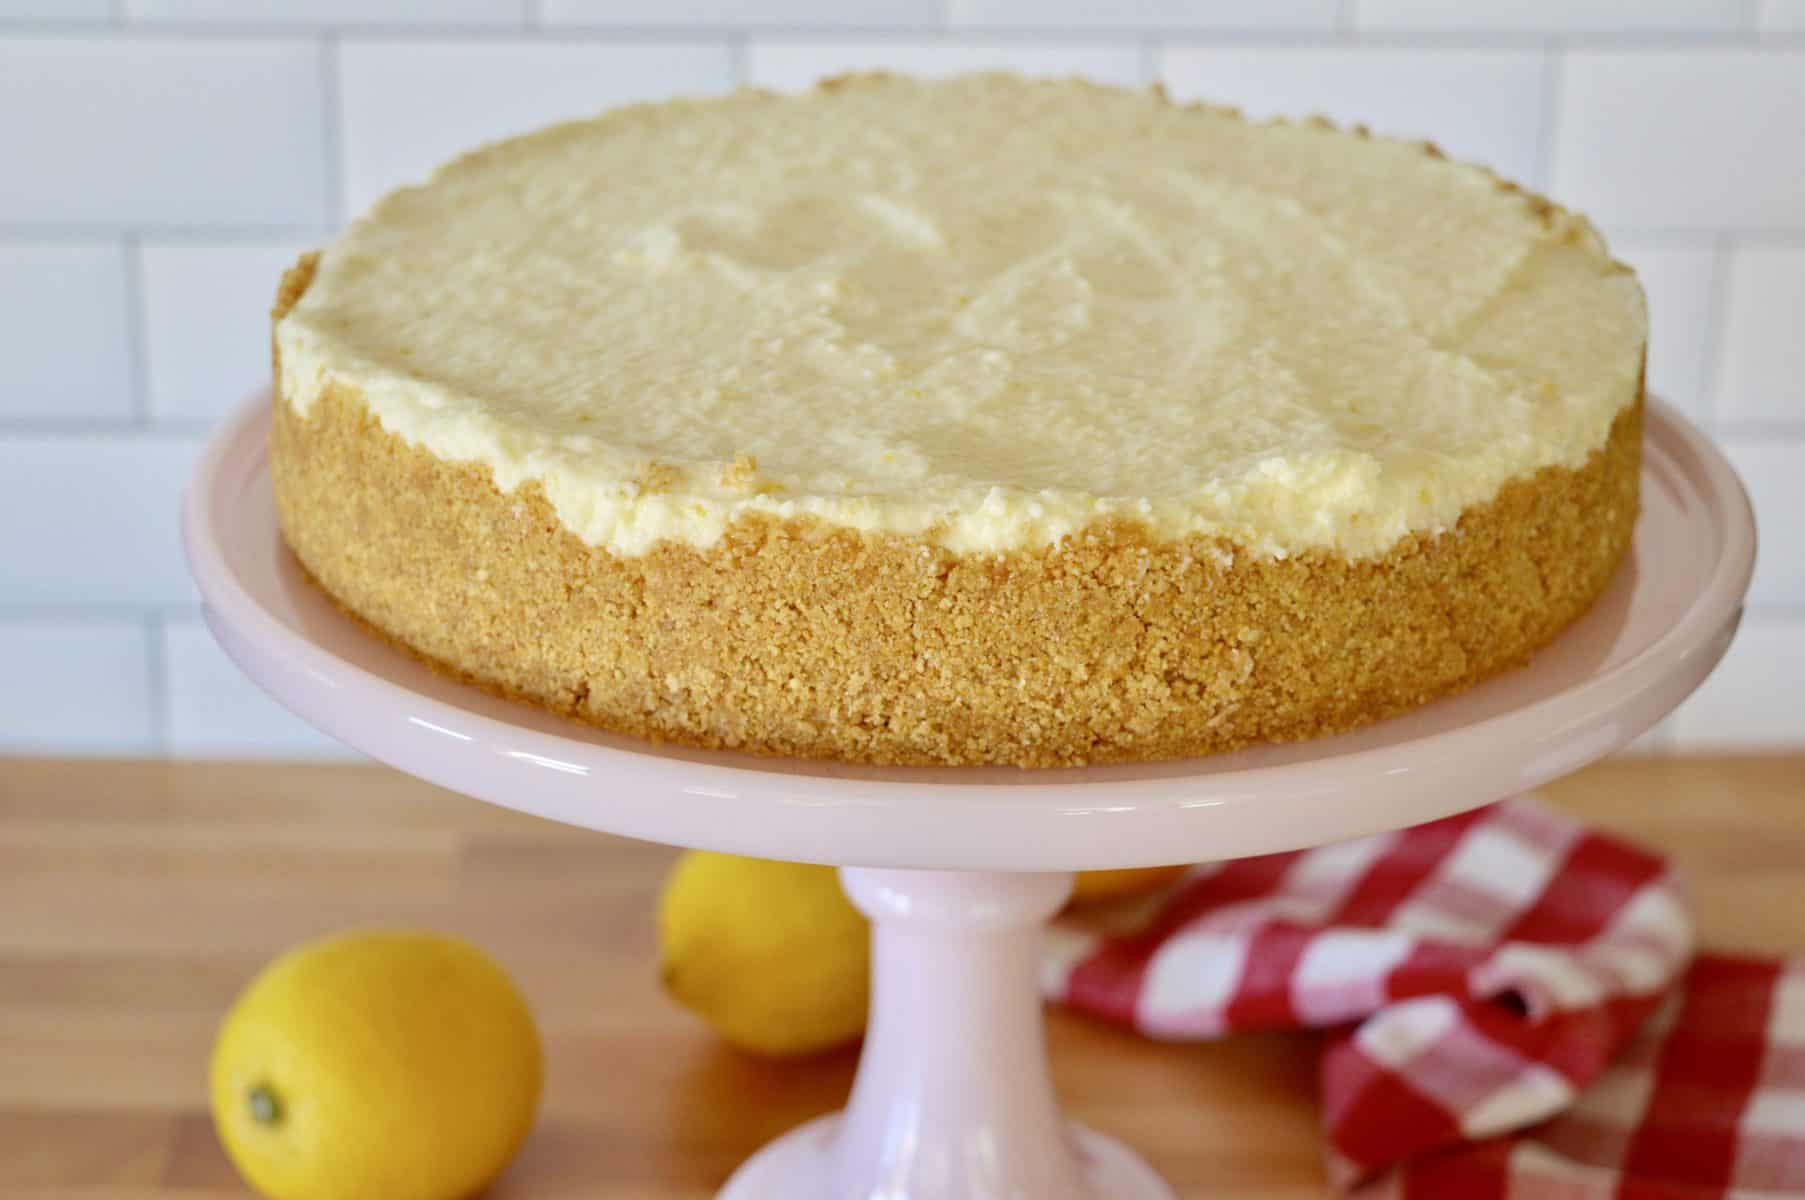 ungarnished no-bake lemon mascarpone cheesecake on a pink cake pedestal.